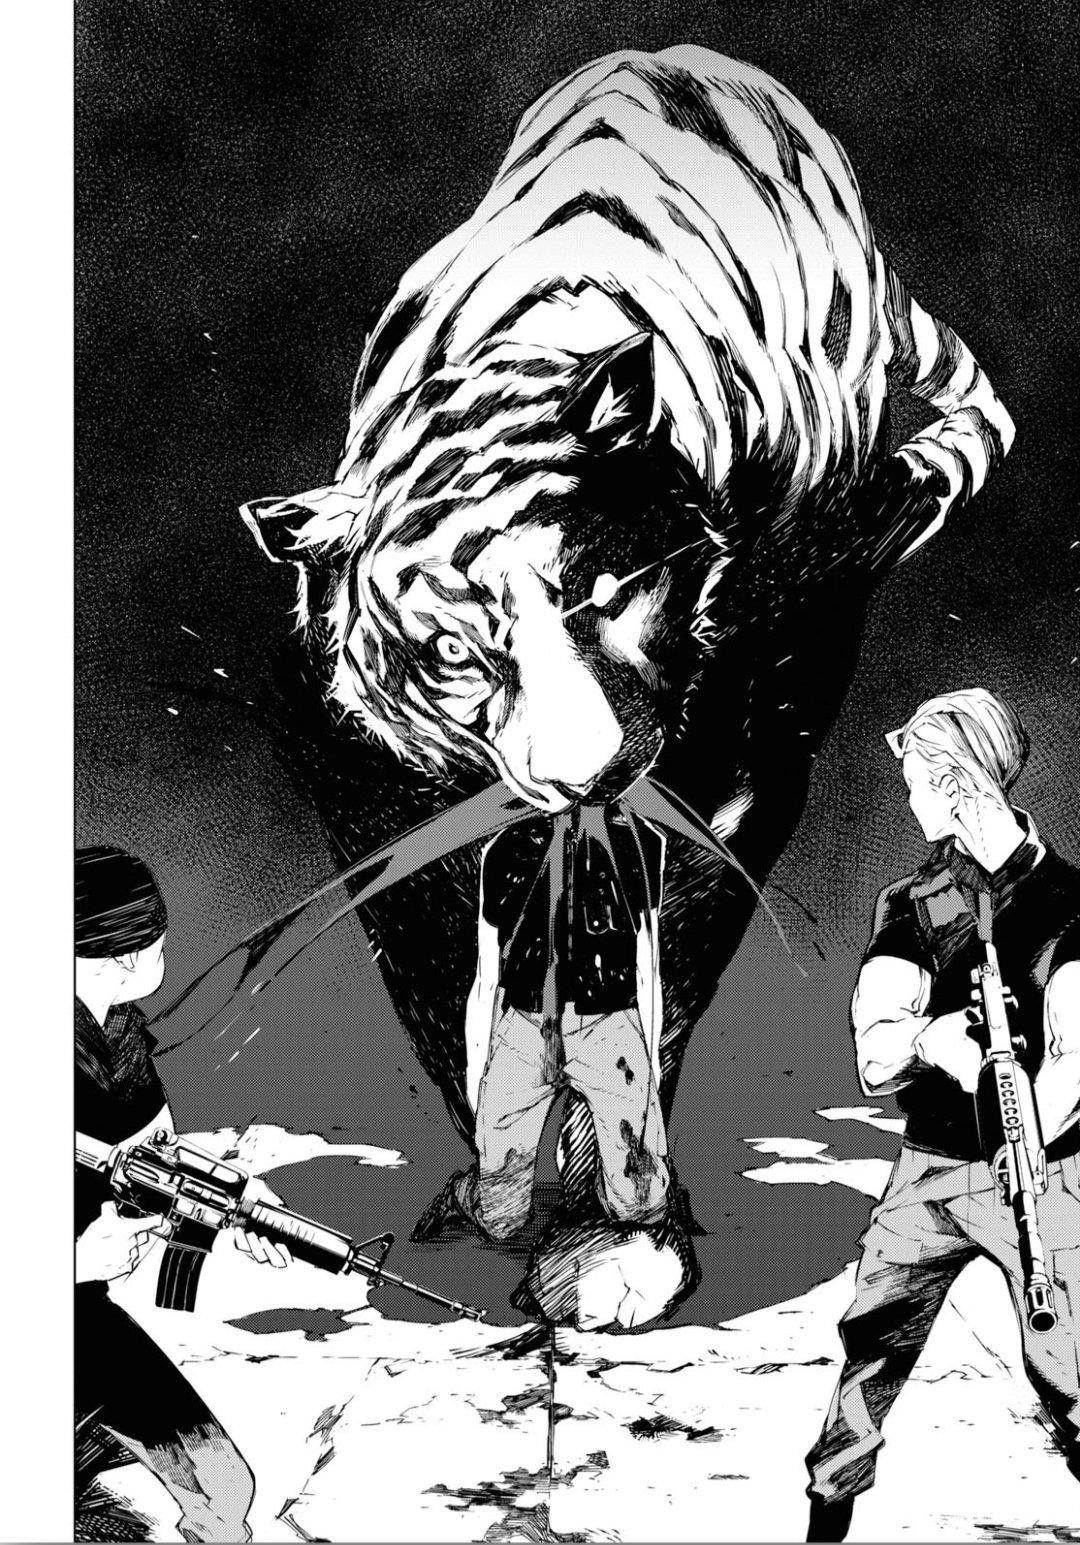 Bad bad kitty Manga nameBeast in 2020 Bad cats, Bungou